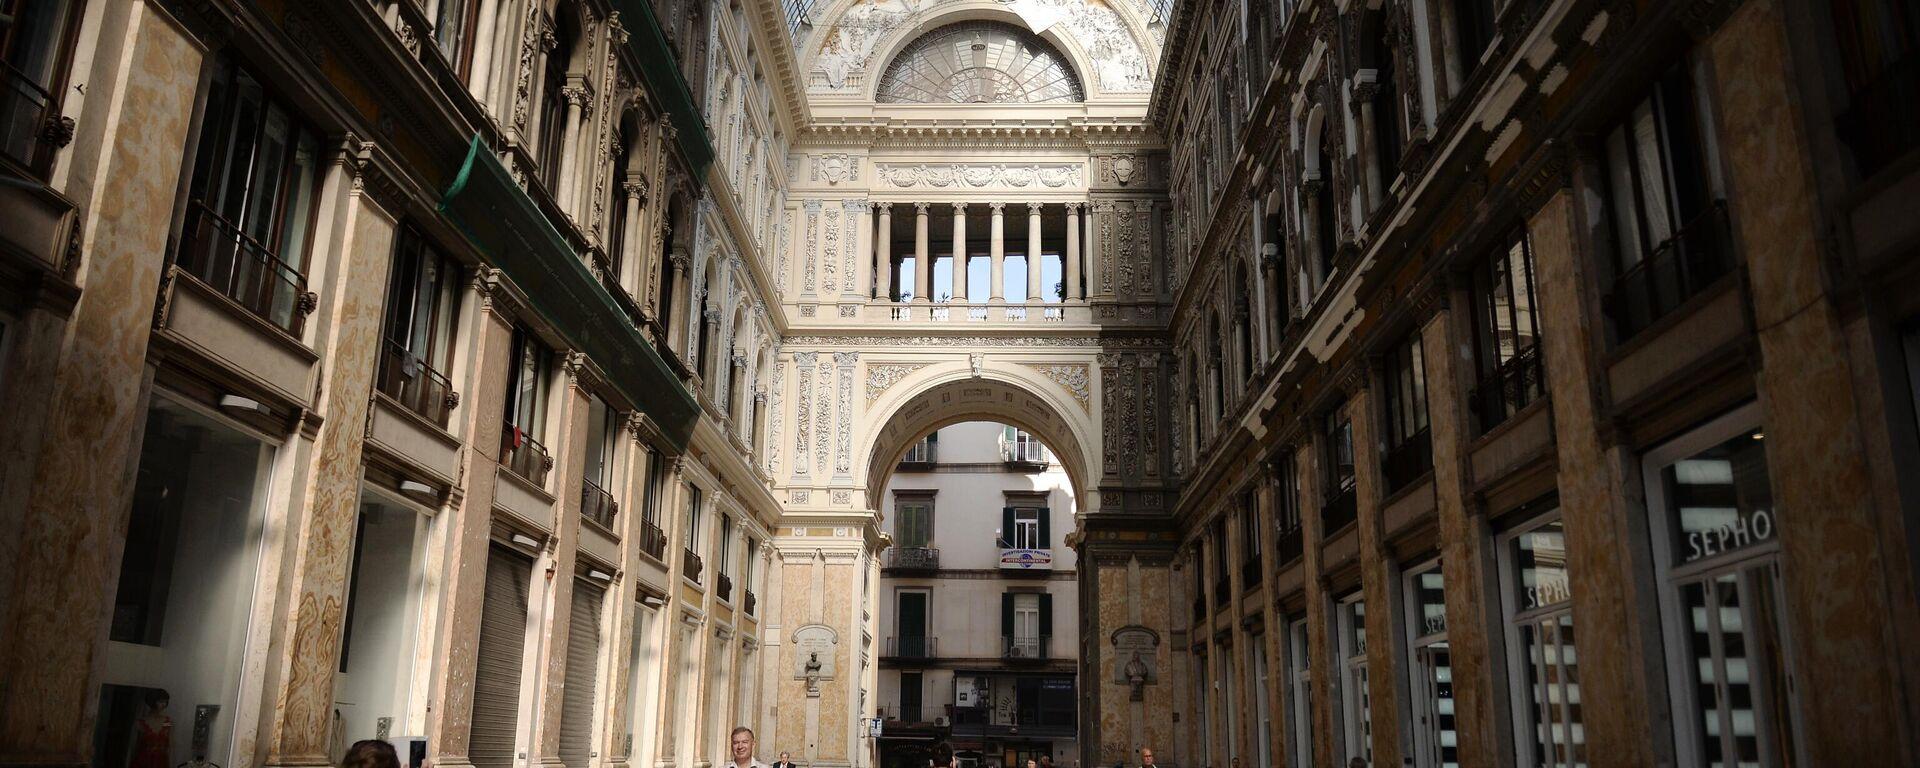 Galleria Umberto, Napoli - Sputnik Italia, 1920, 10.09.2021